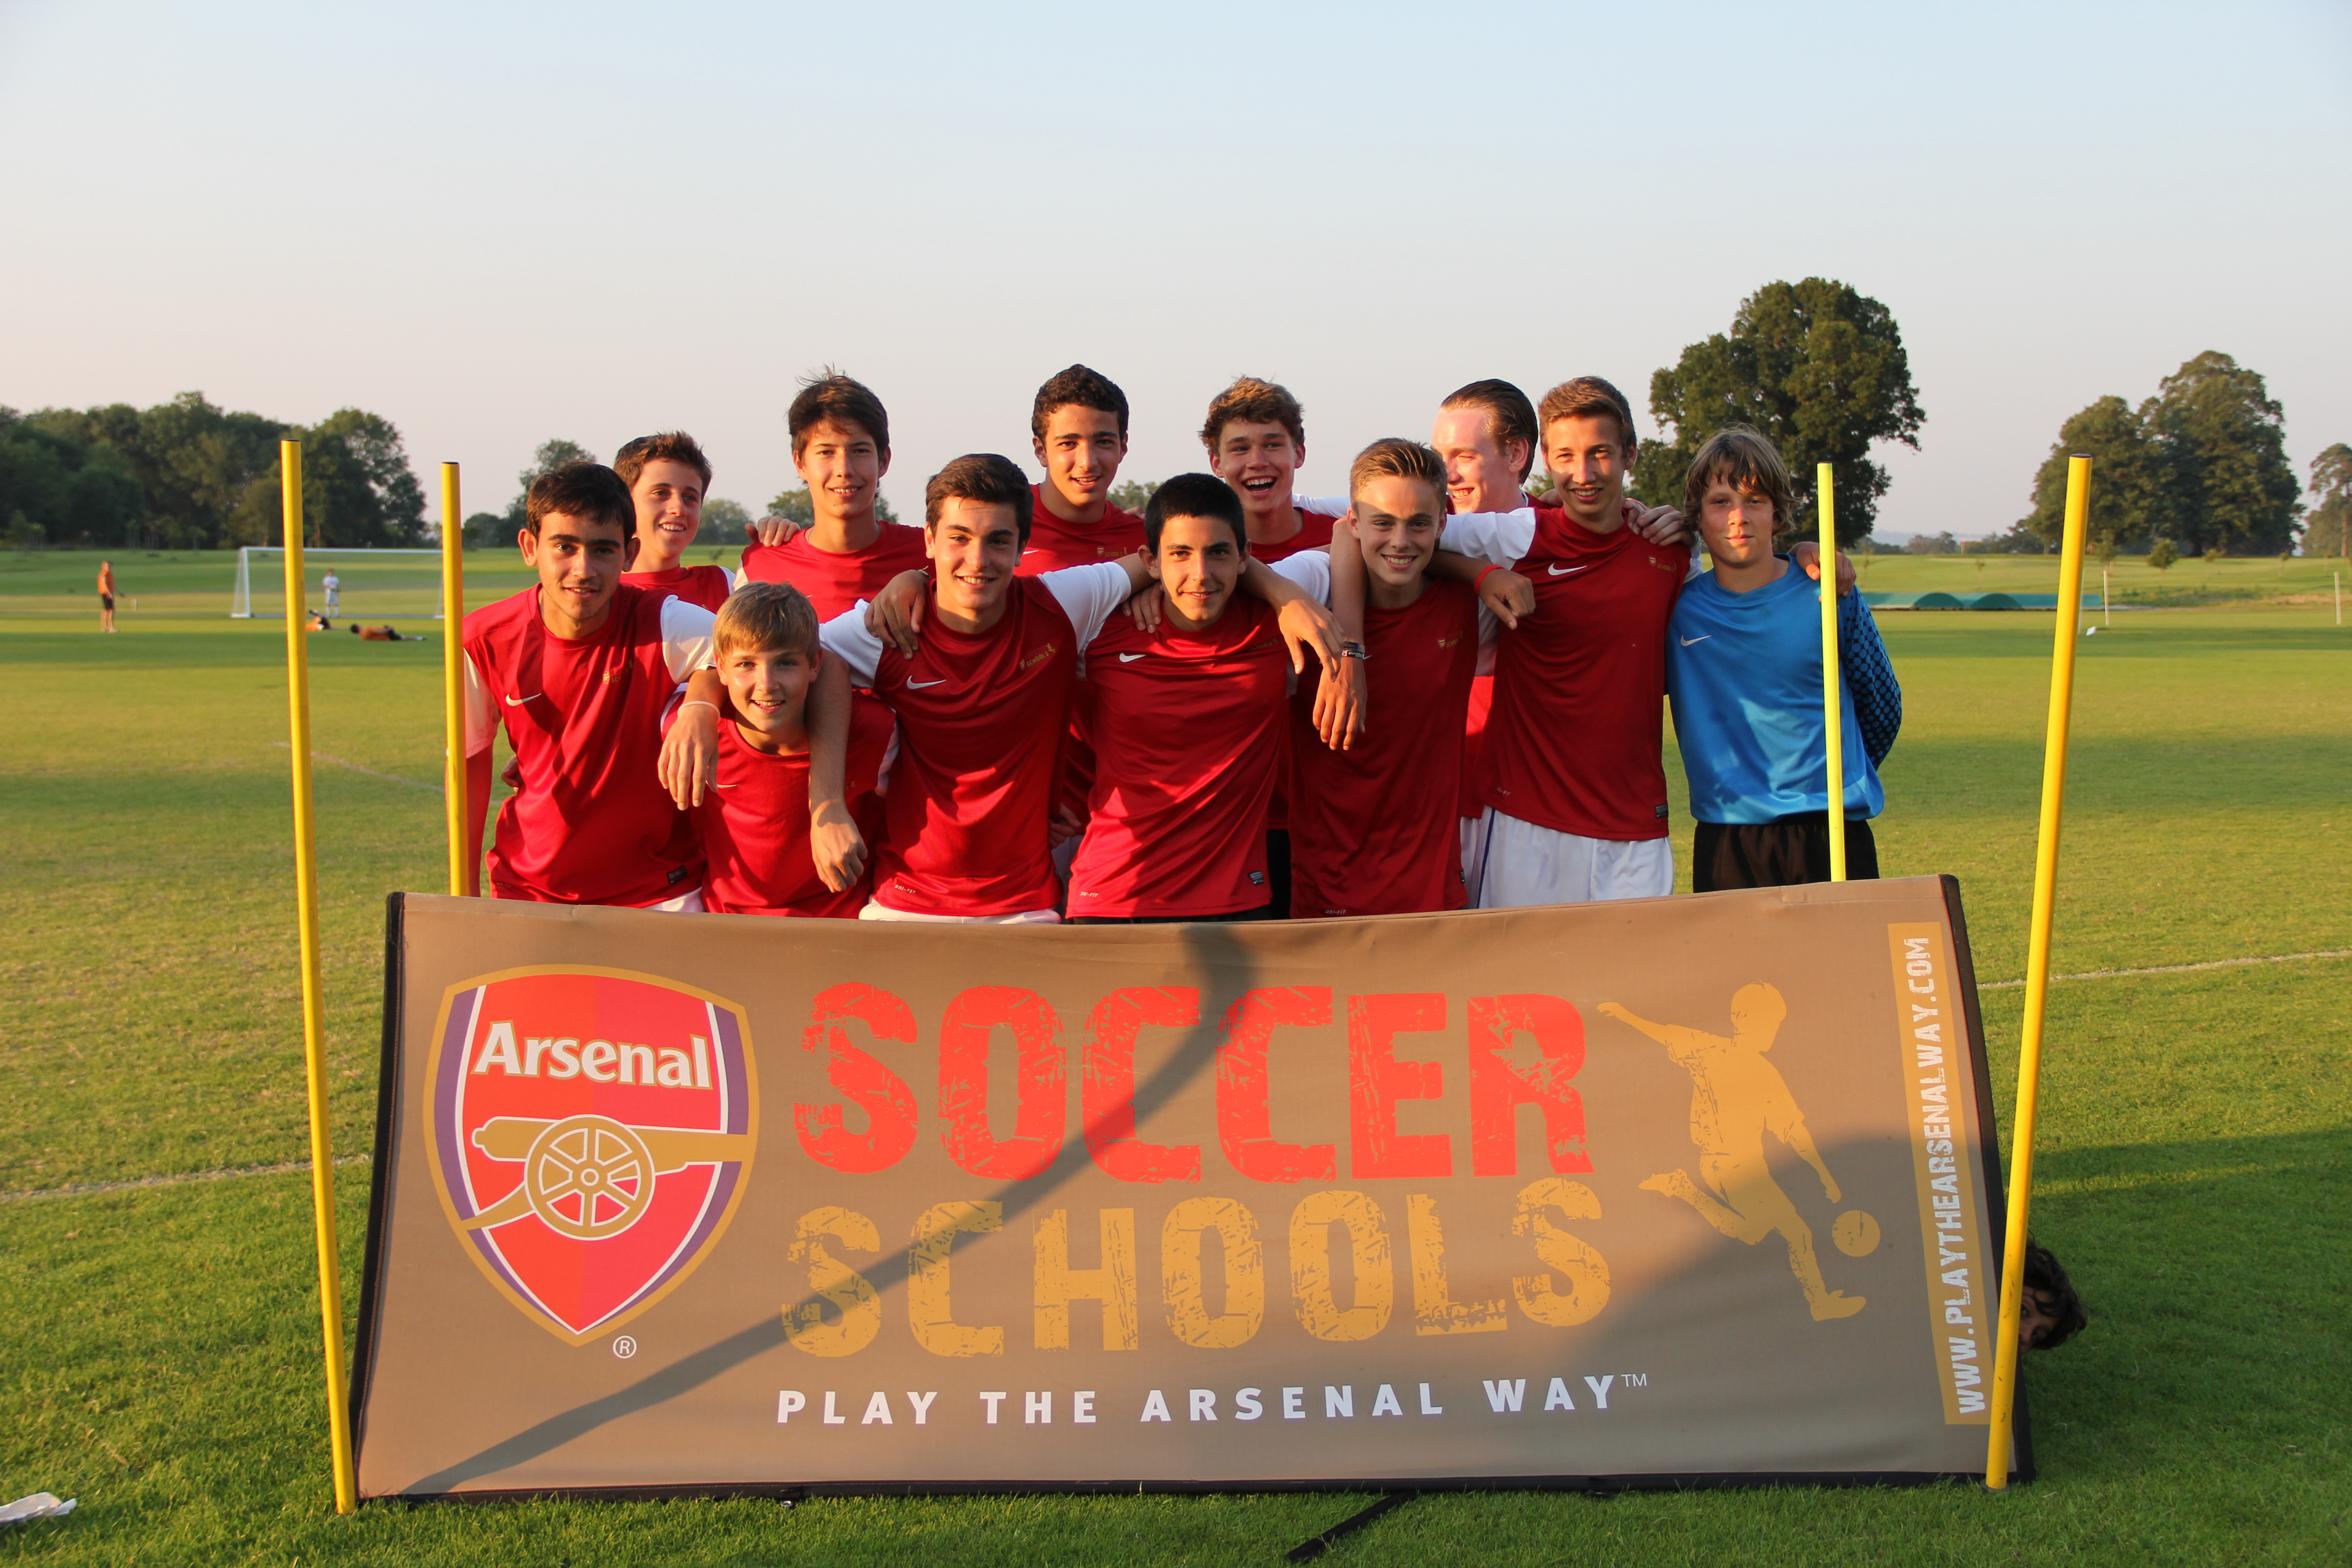 arsenal-soccer-schools